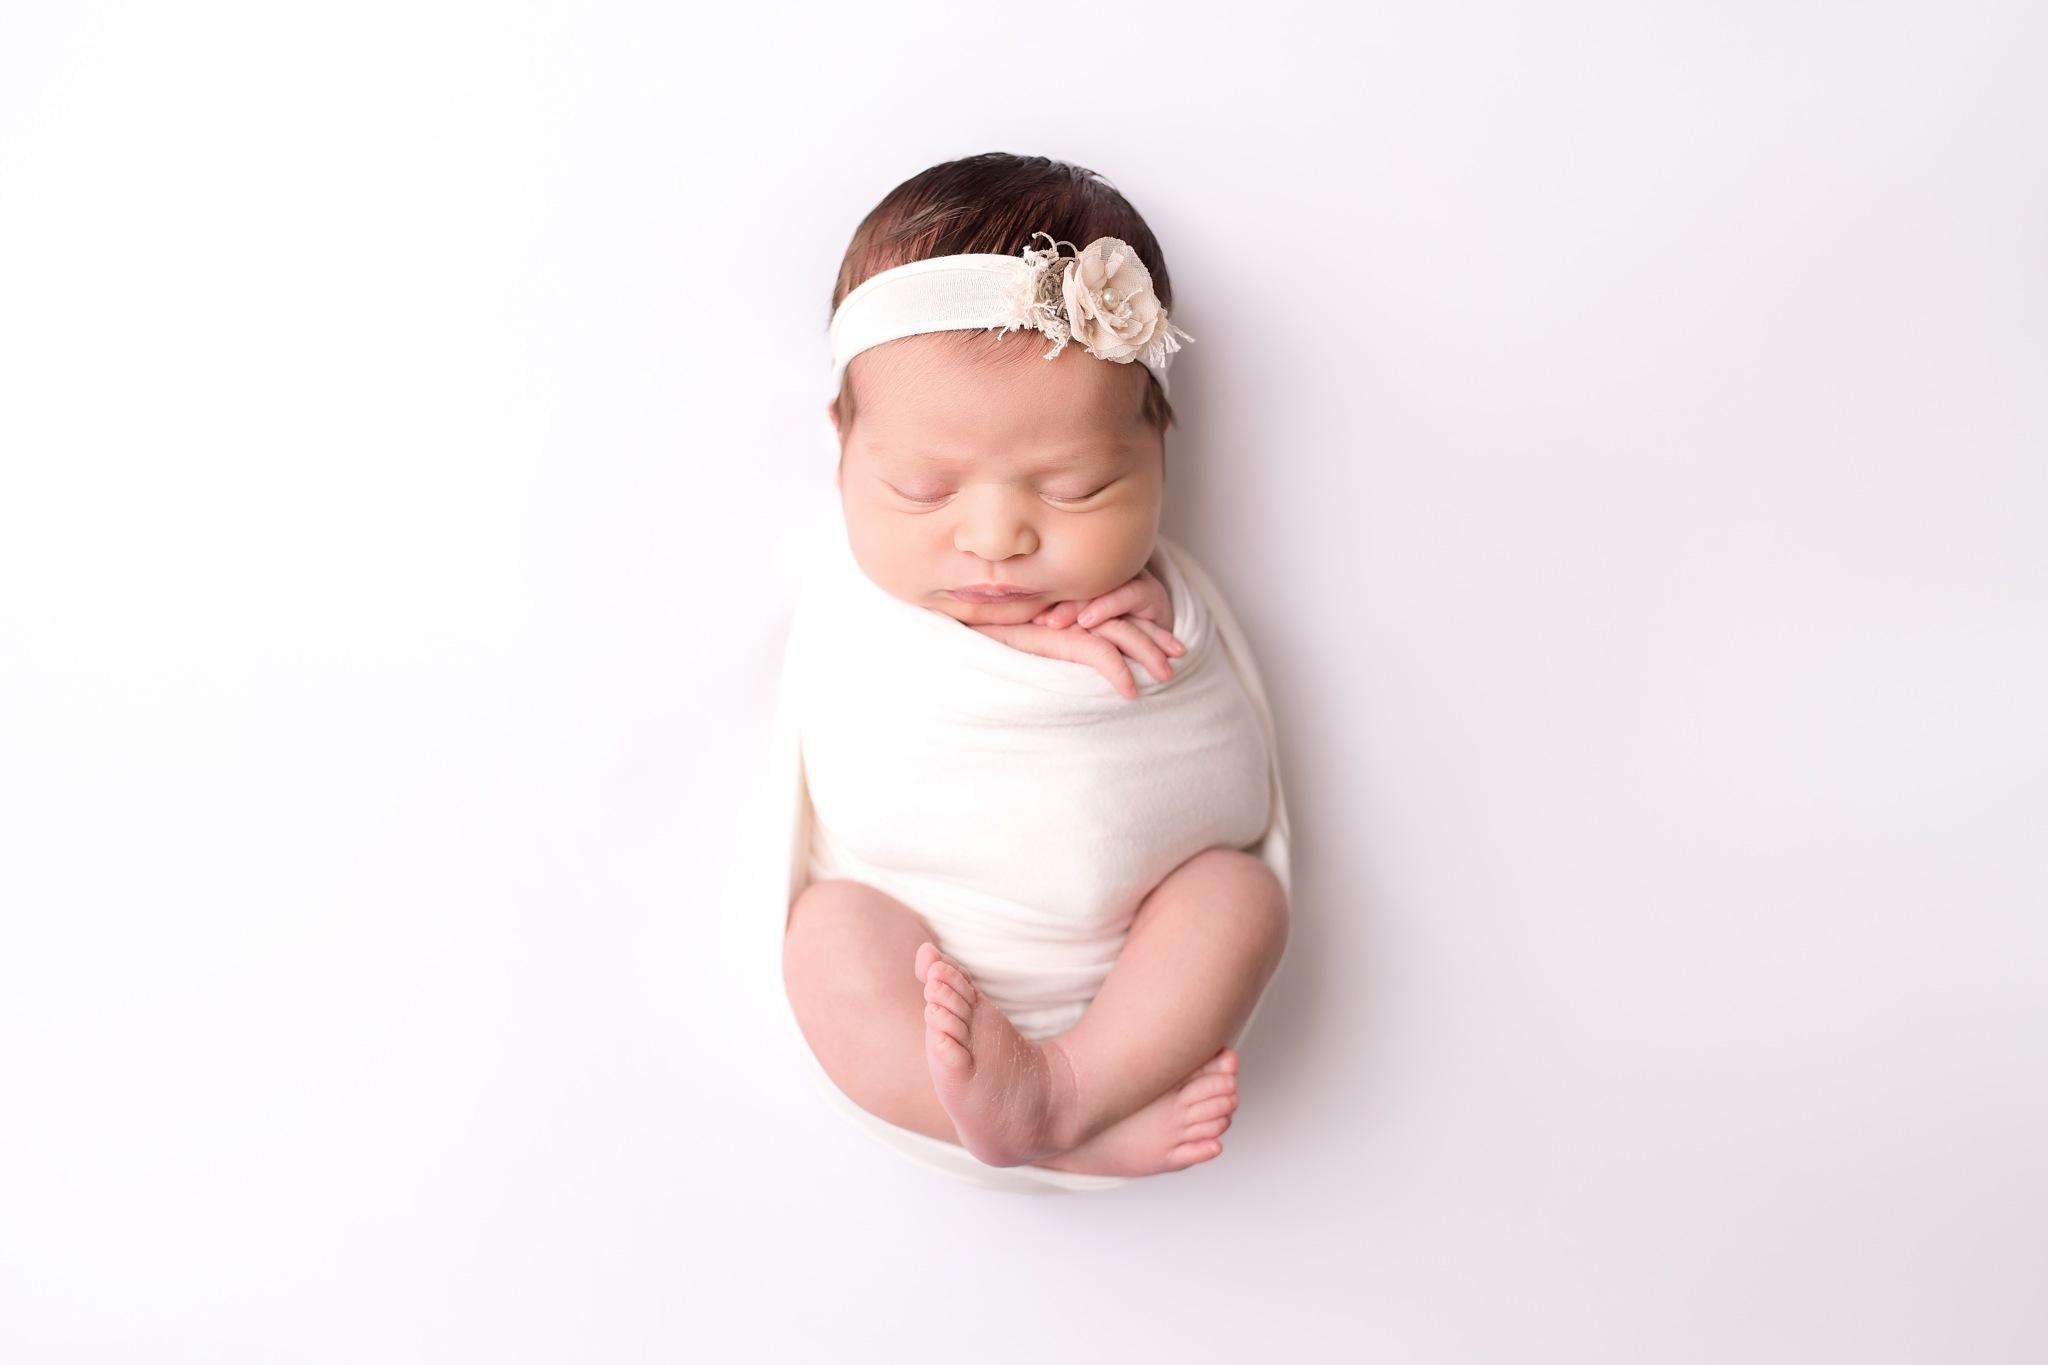 Cypress Newborn Photography by Bri Sullivan by cherrystreetphoto